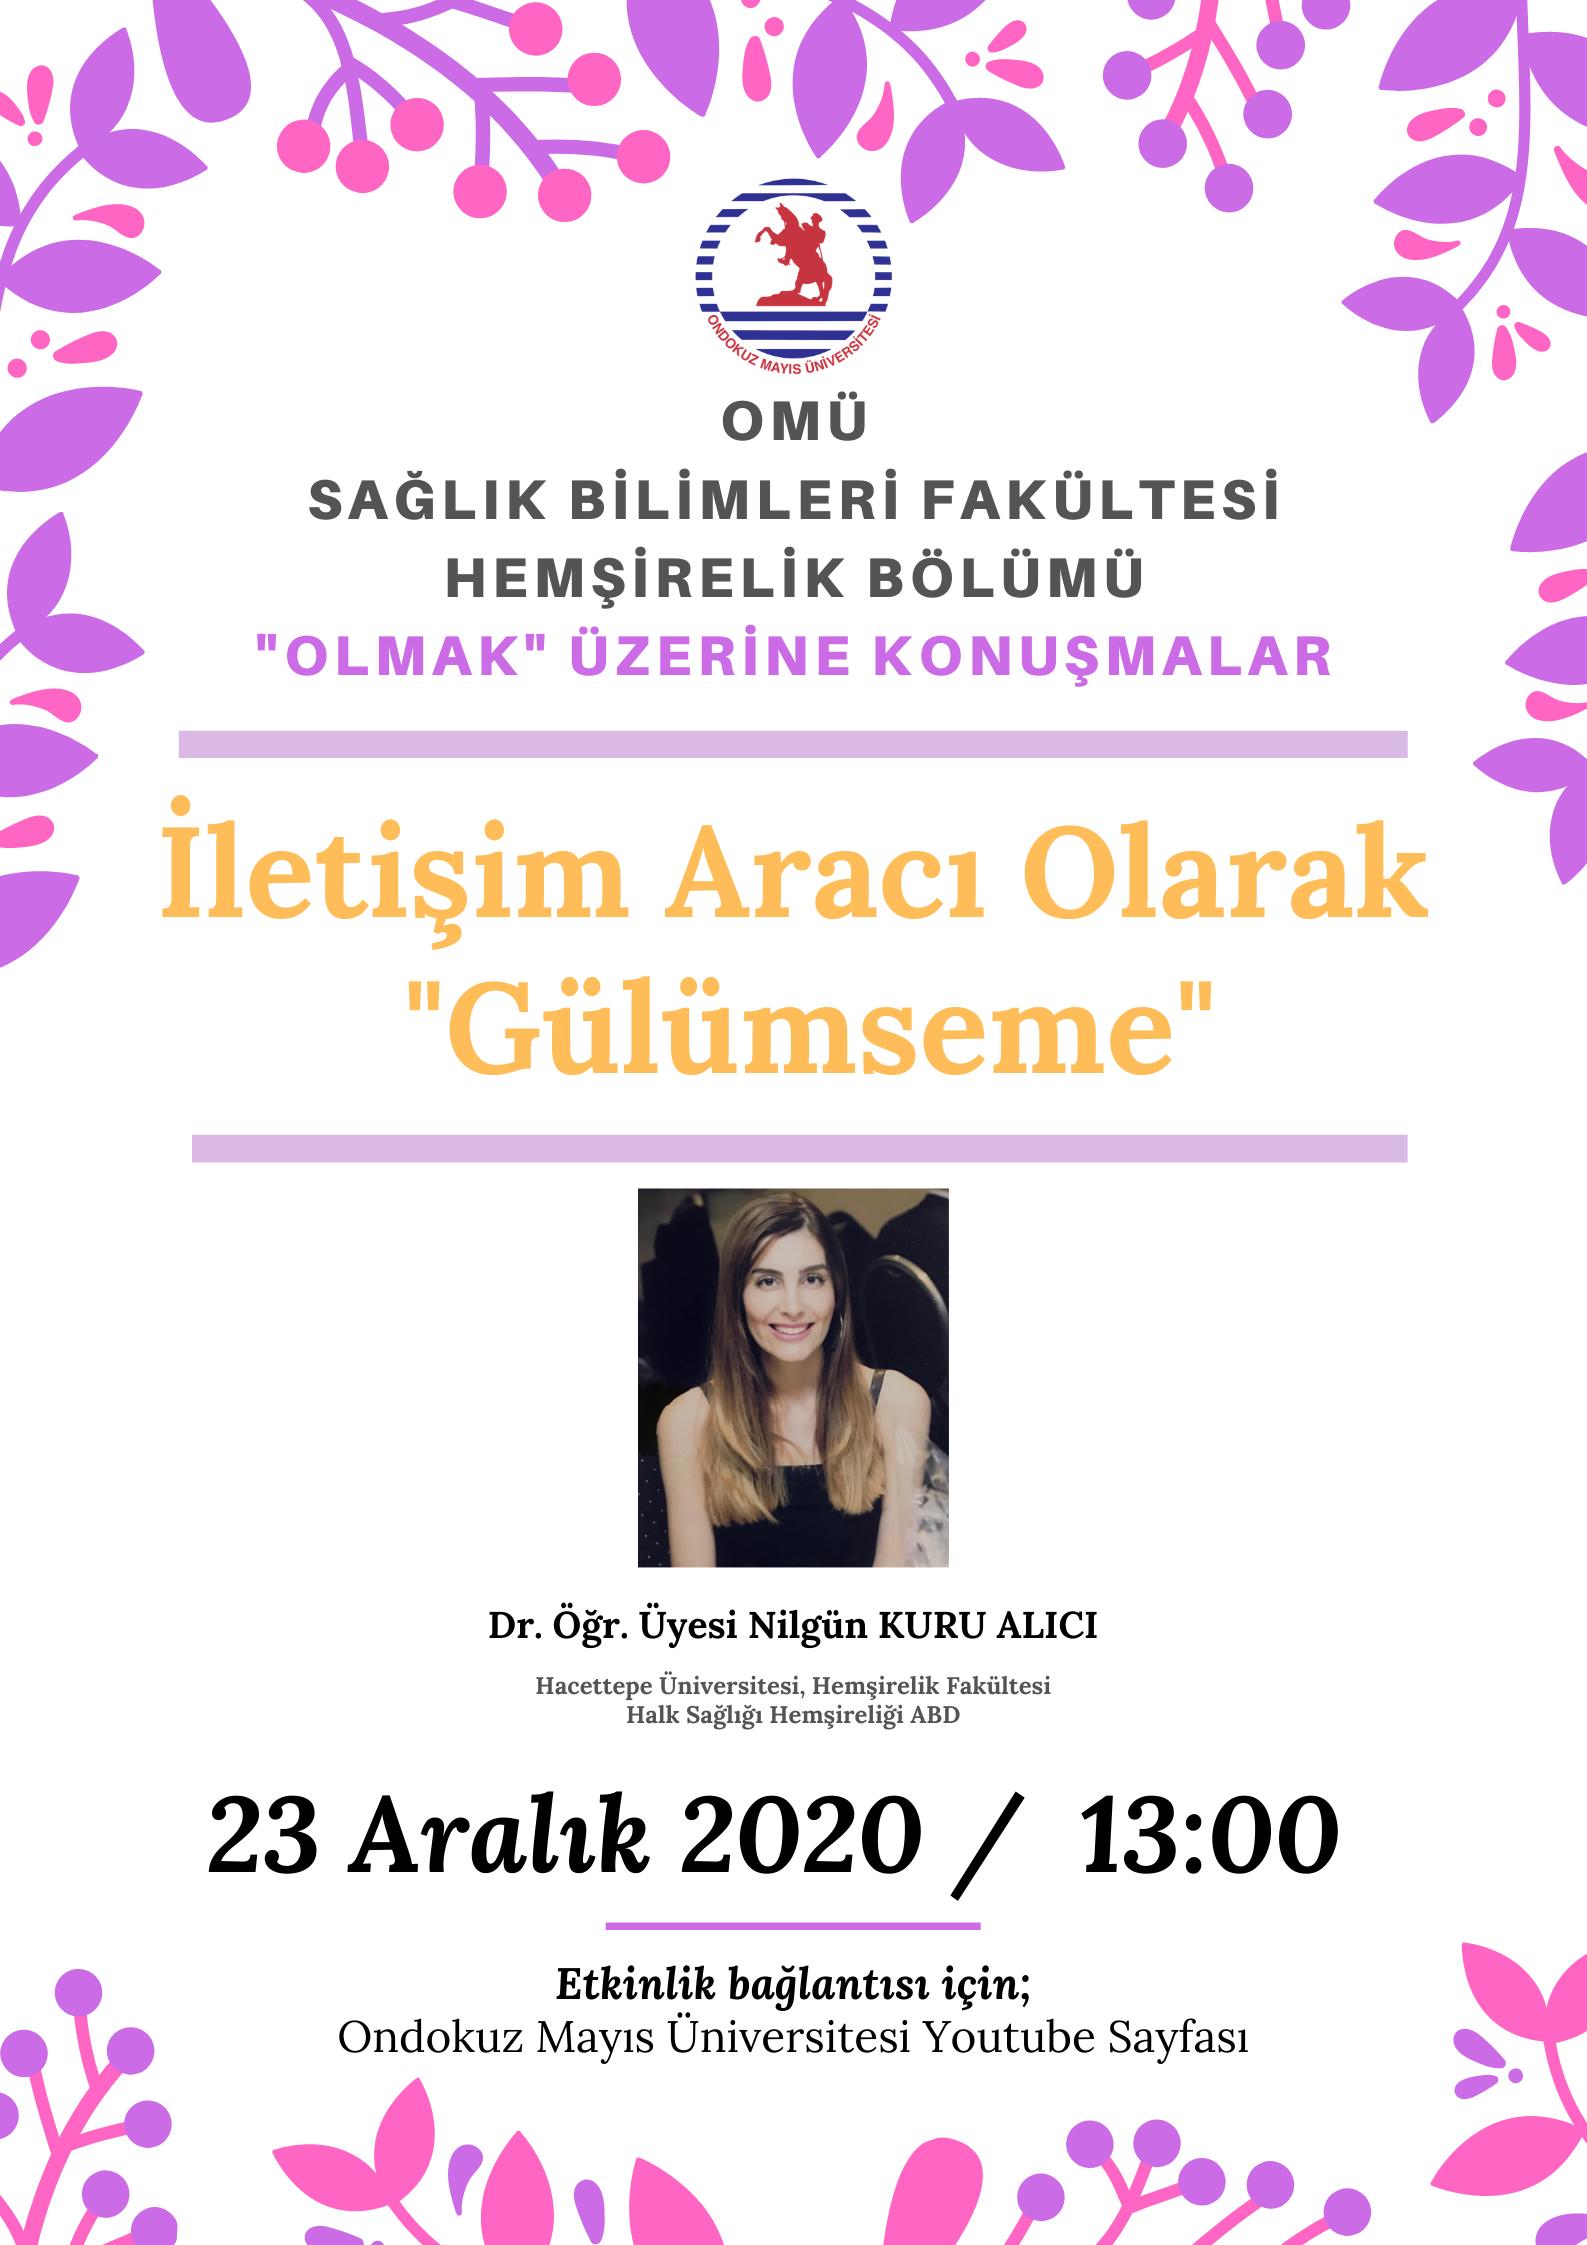 https://www.omu.edu.tr/sites/default/files/iletisim_araci_olarak_gulumseme.png